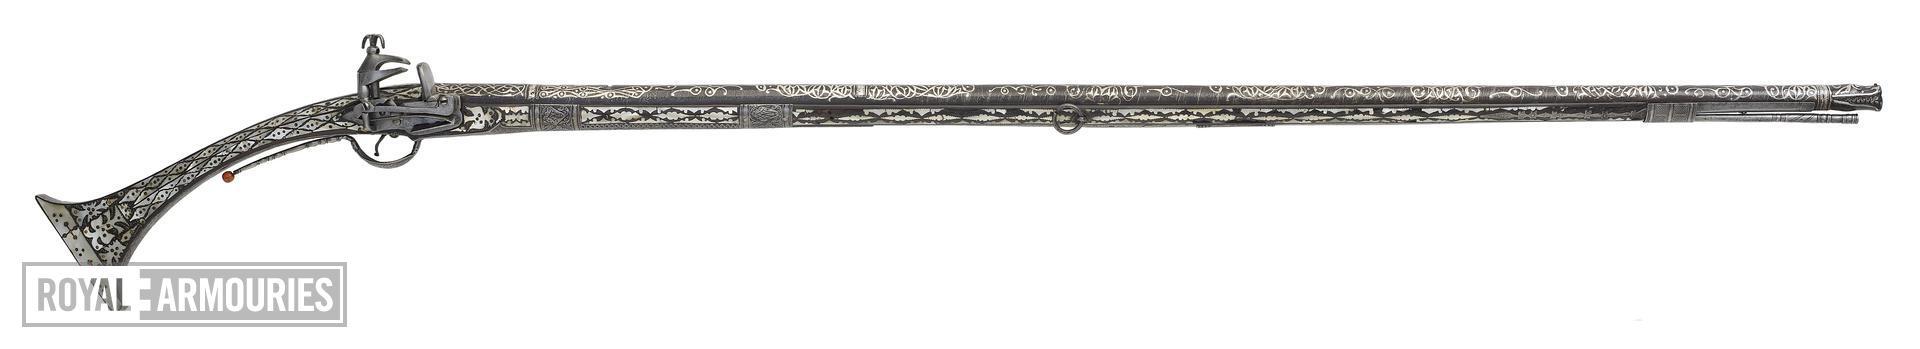 Flintlock musket (arnautka)